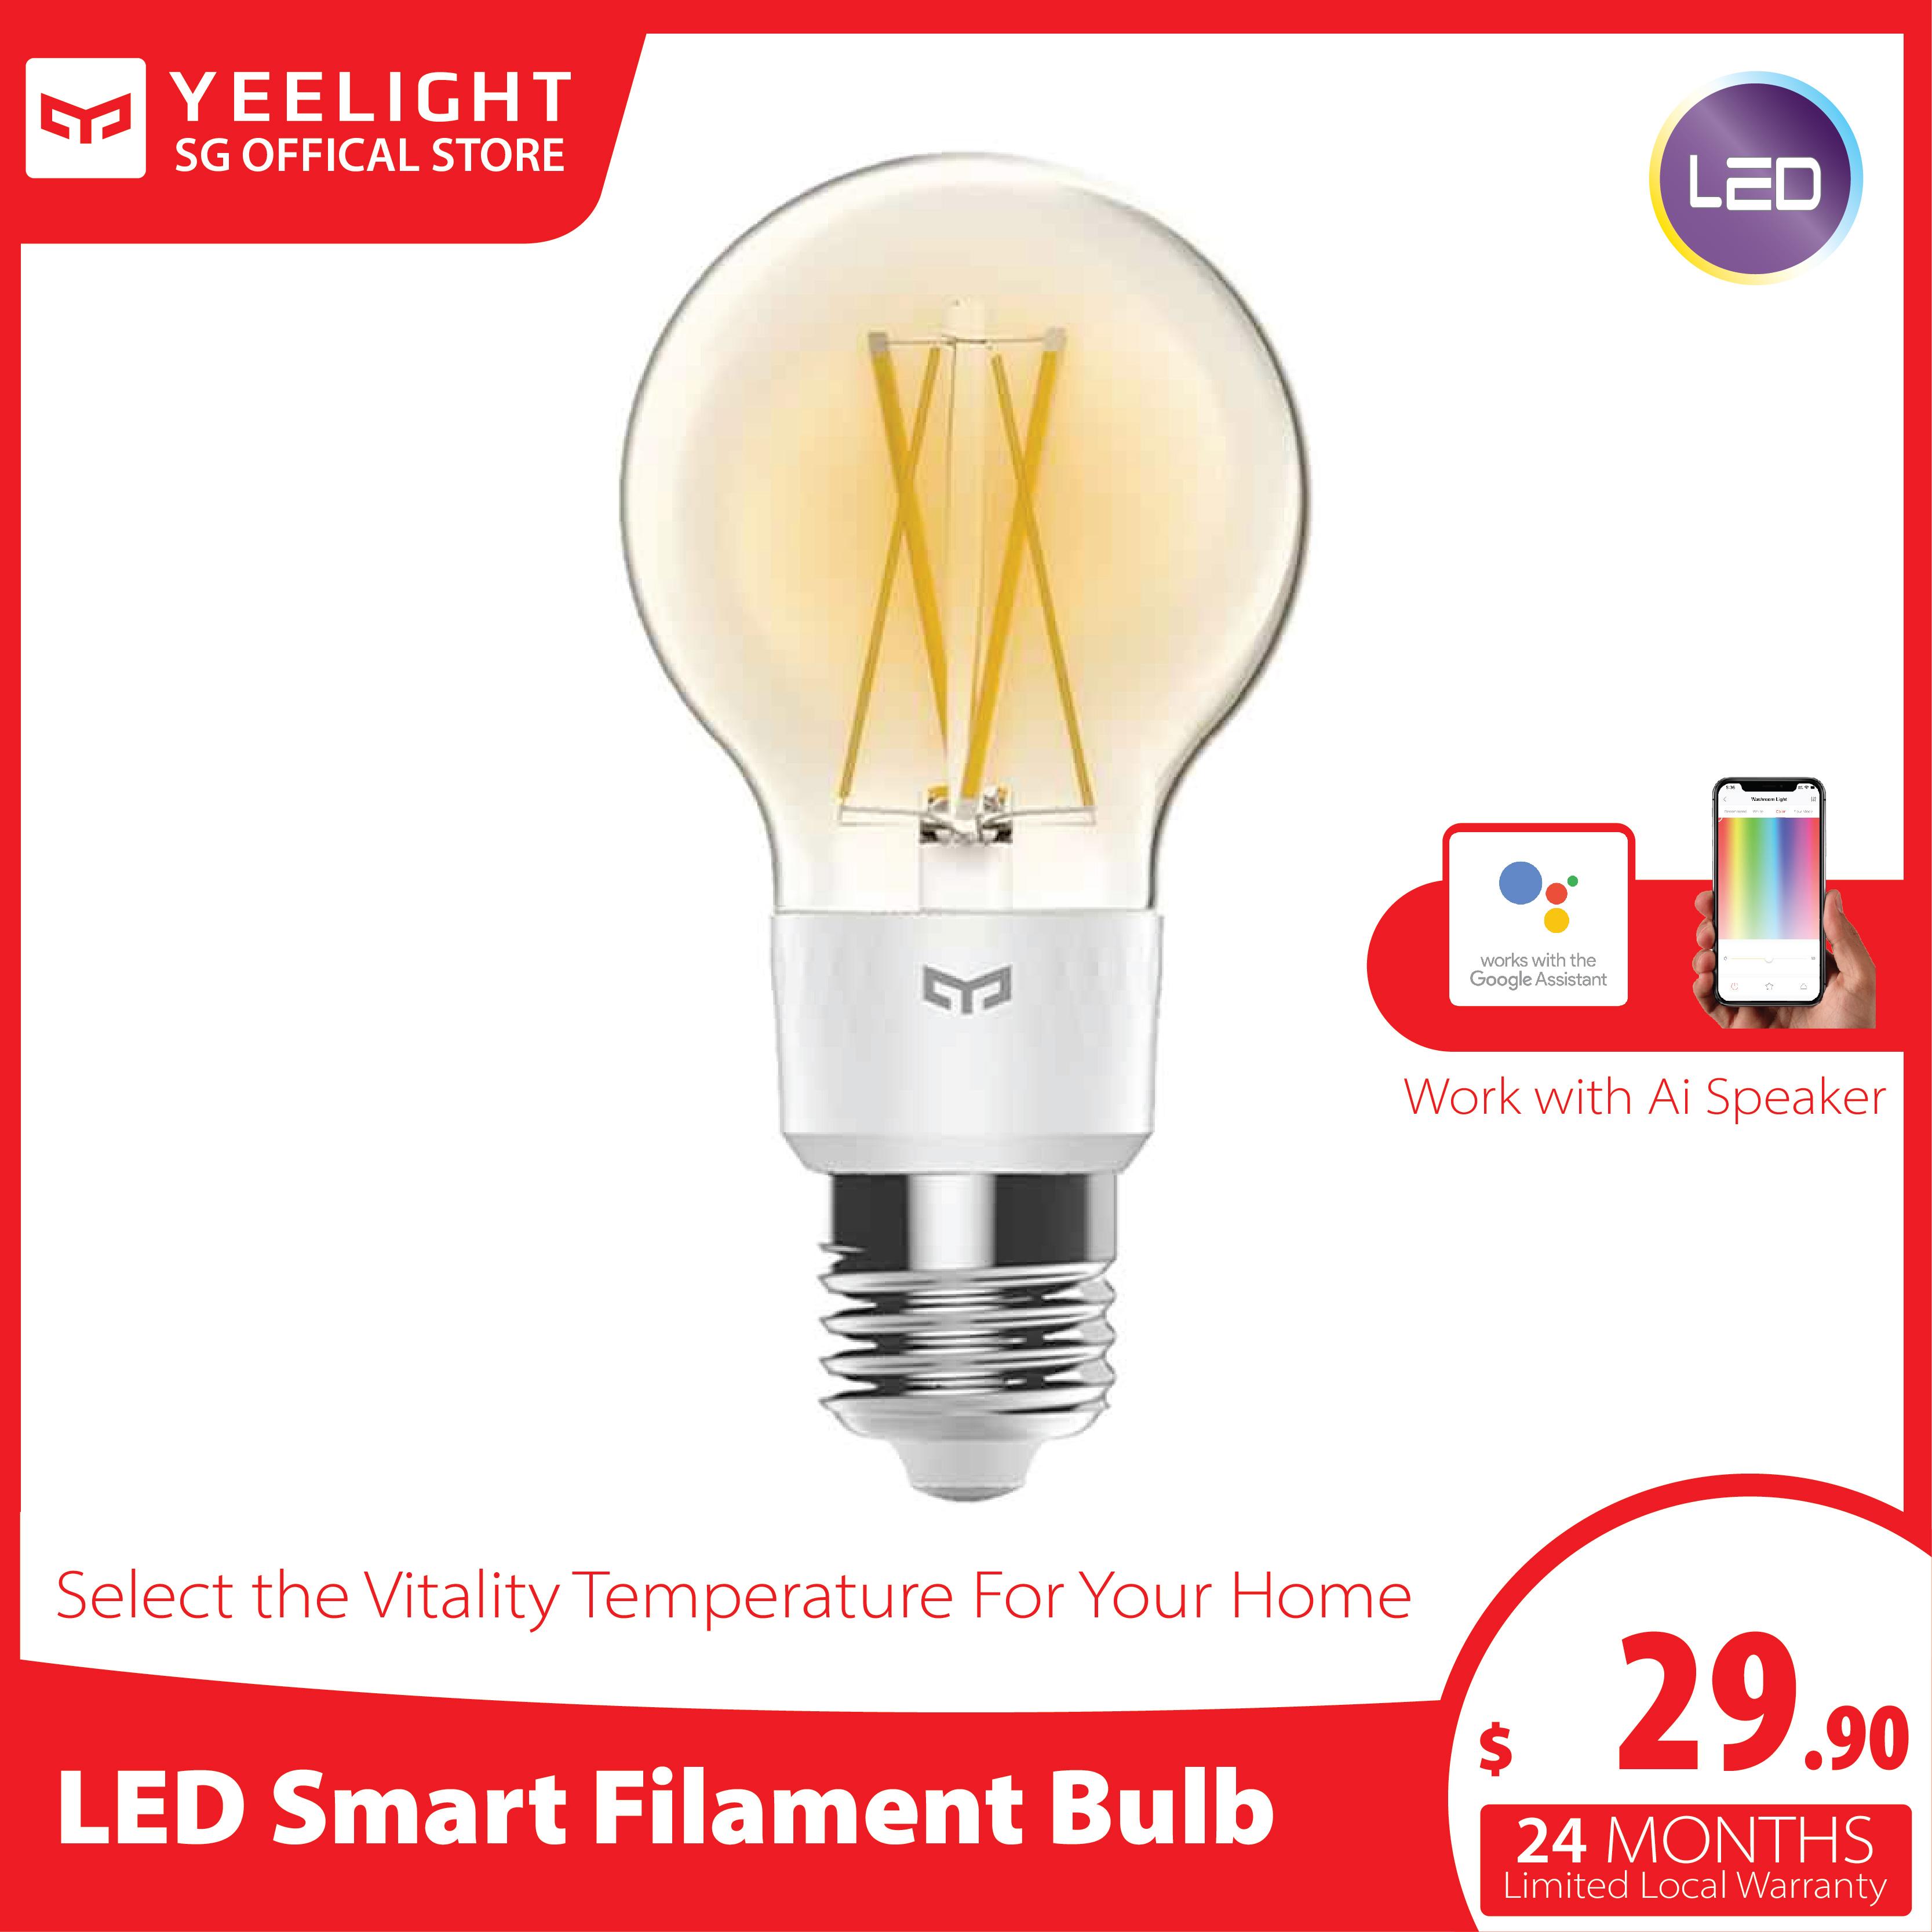 Yeelight LED Filament Bulb